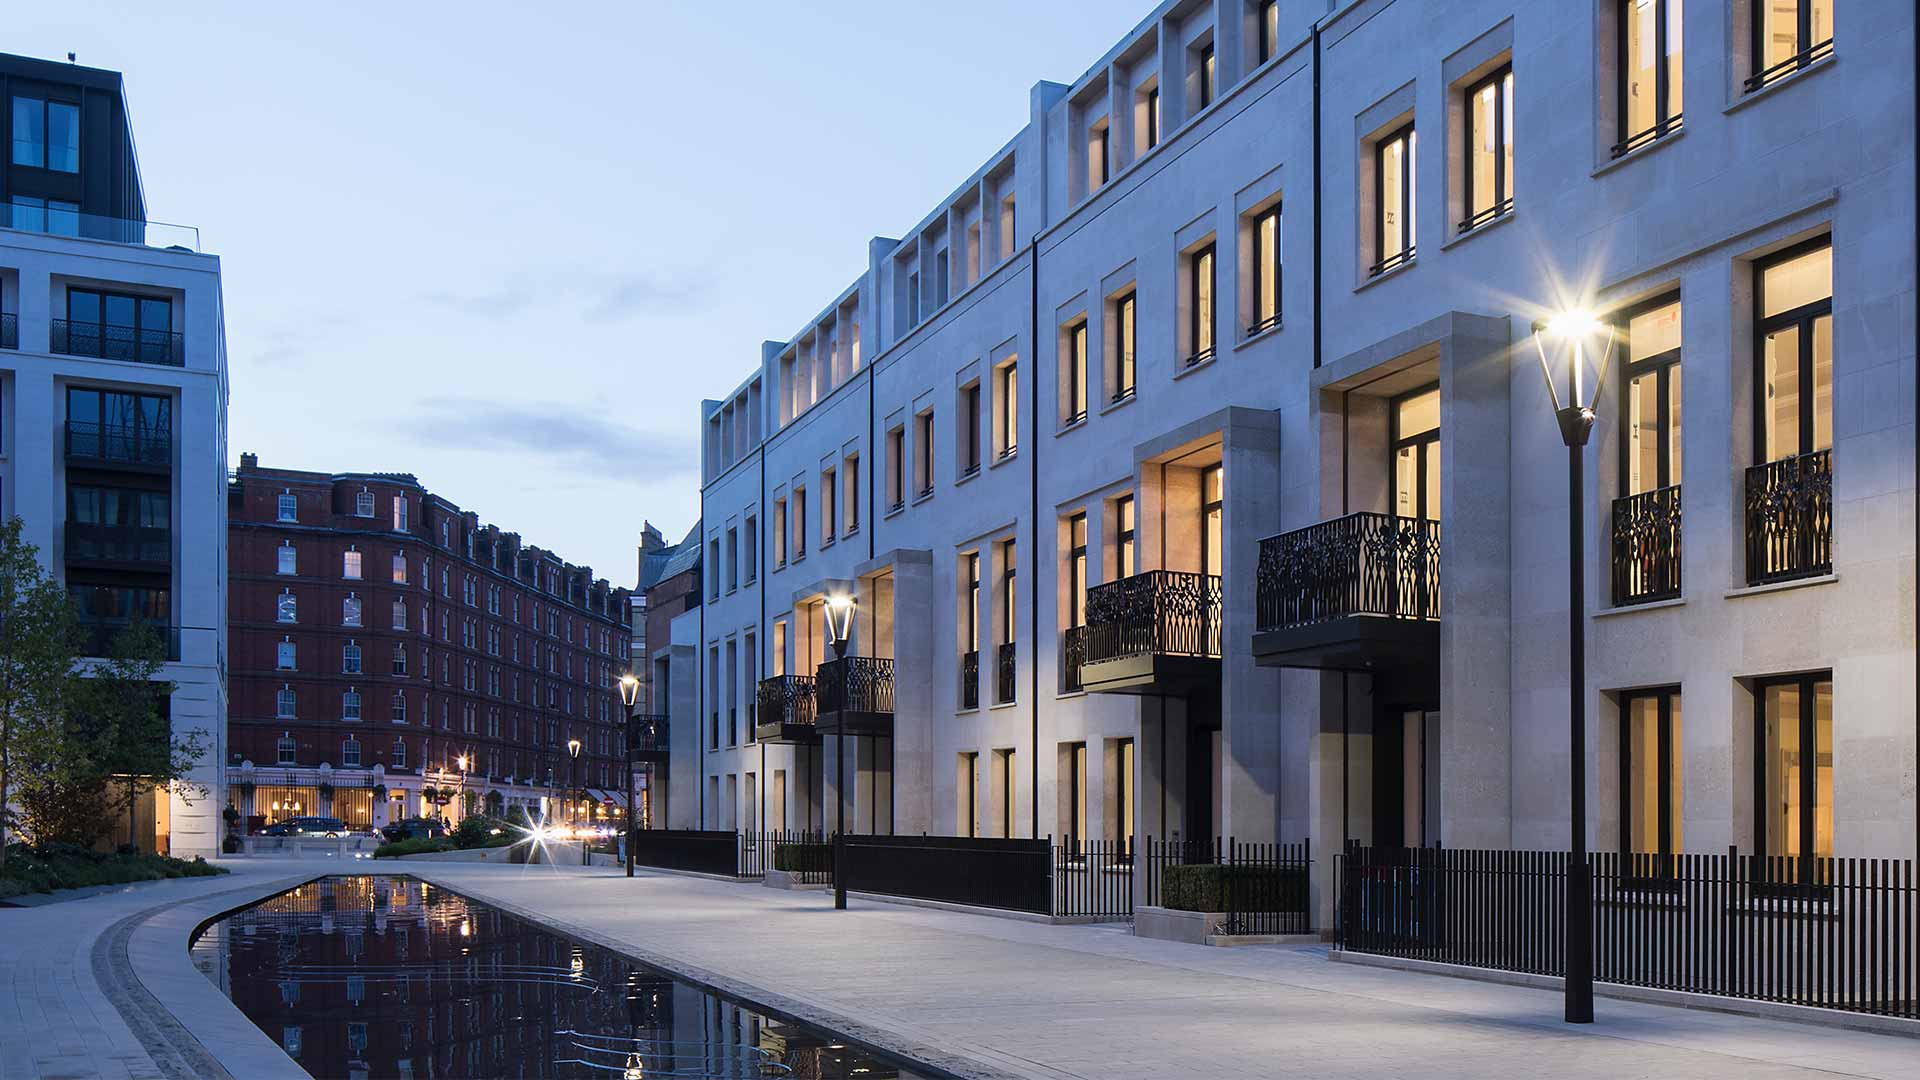 Exterior Lighting Design Scheme Bespoke Lamp Post Chelsea Barracks London Consultants Nulty